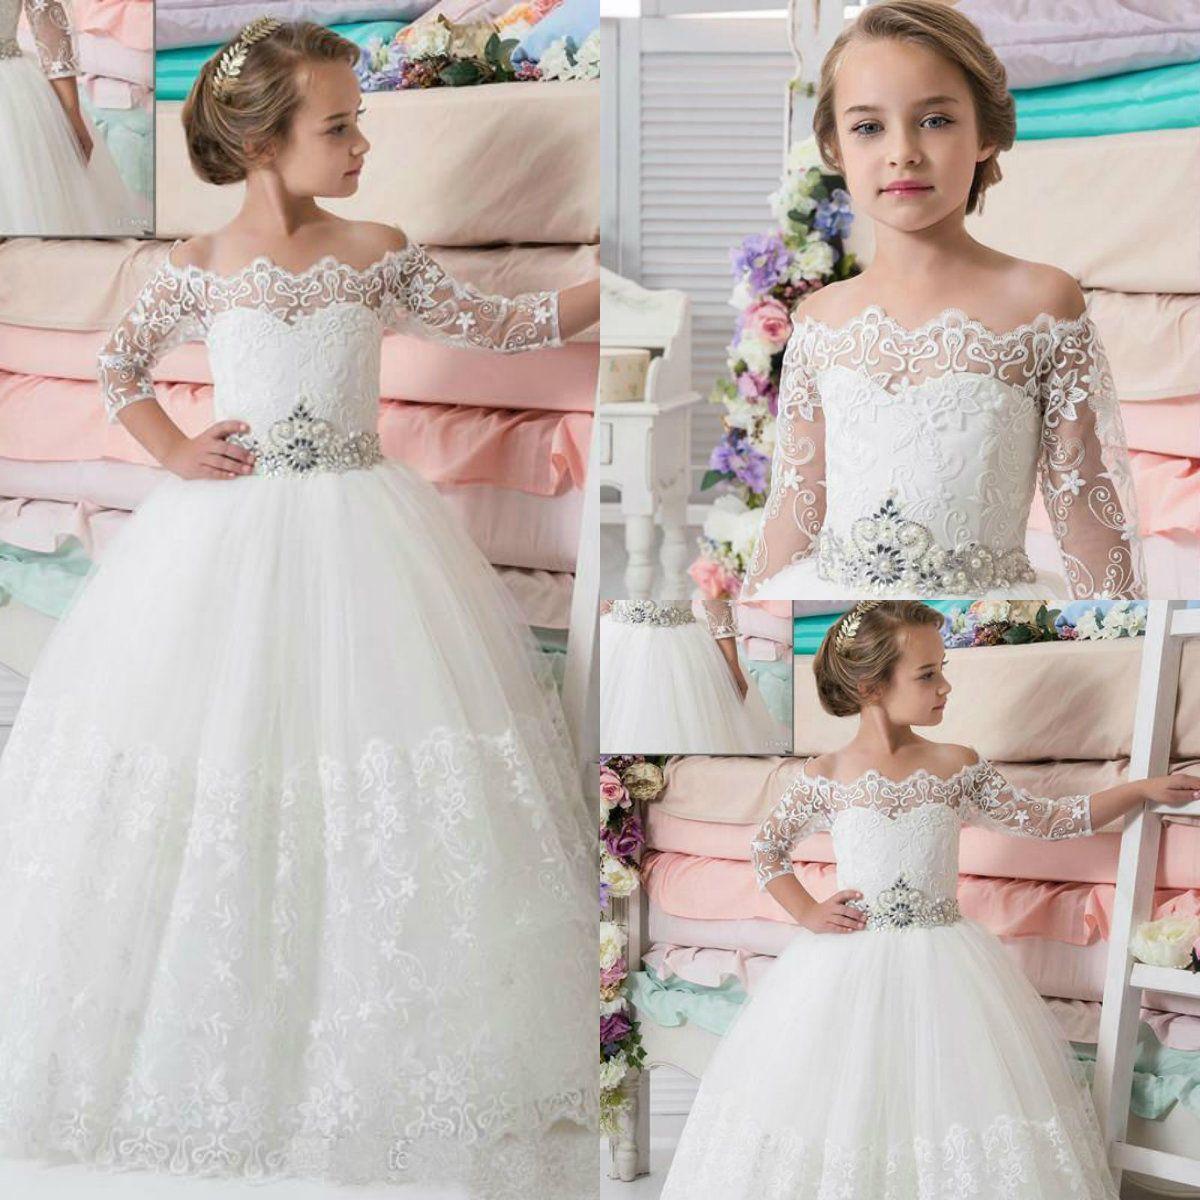 2018 Pretty Flower Girls Dresses Off Shoulder Lace Applique Beaded